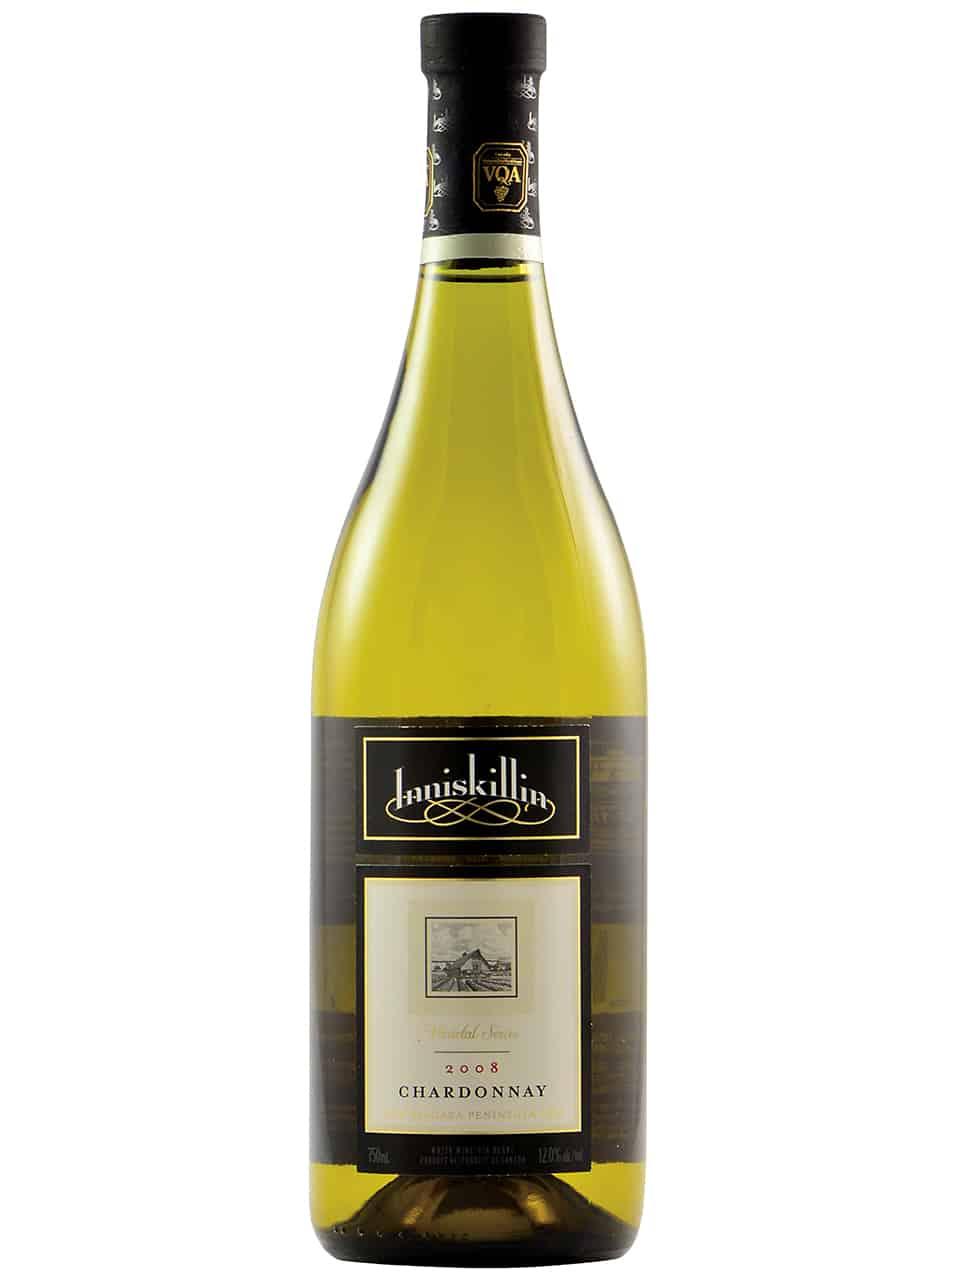 Inniskillin Chardonnay VQA